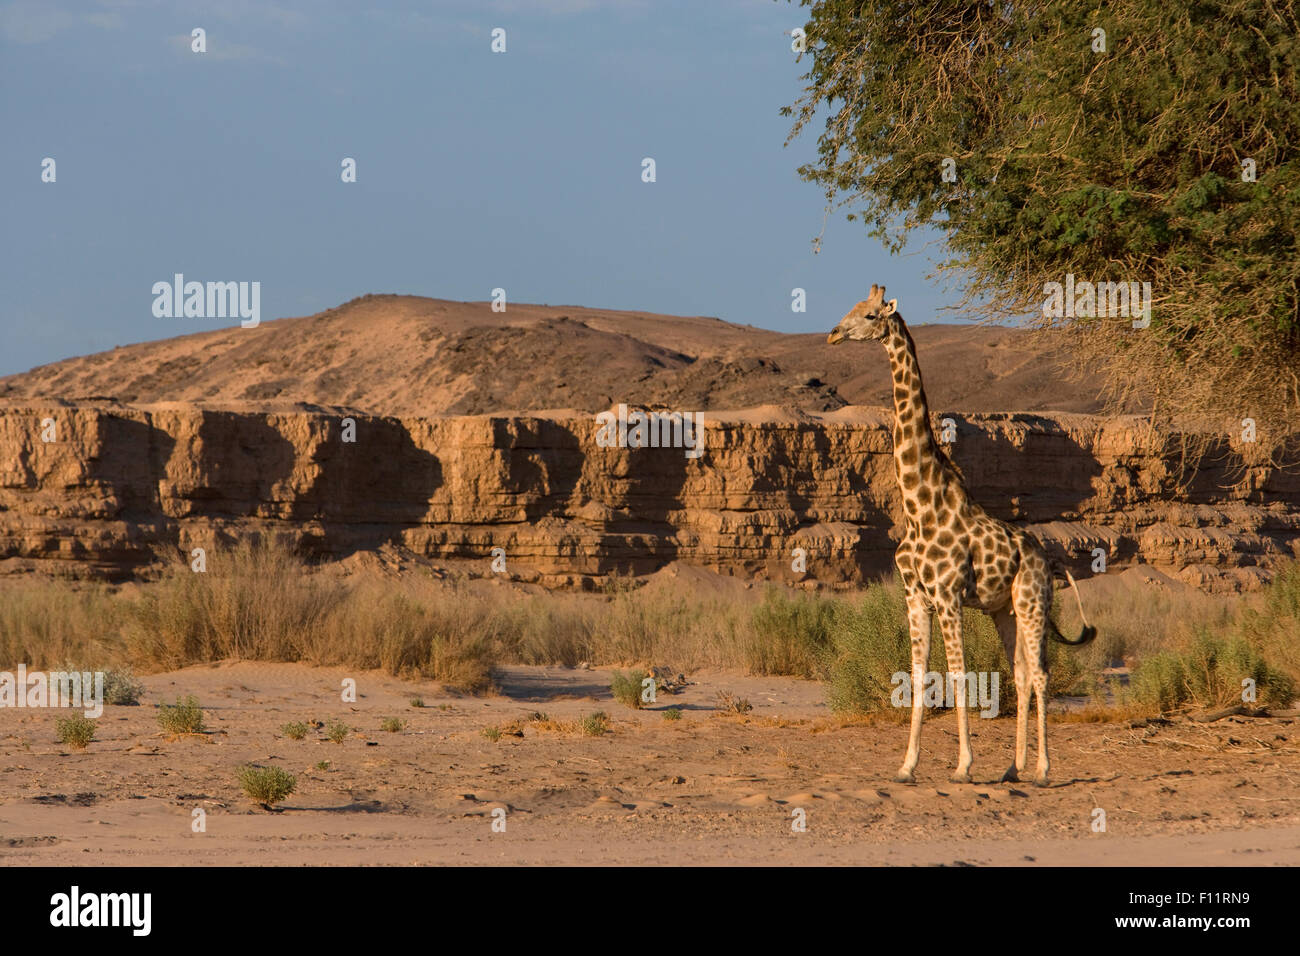 Angolan Giraffe, Namibian Giraffe (Giraffa camelopardalis angolensis) Adult standing the desert Namib-Skeleton Coast - Stock Image